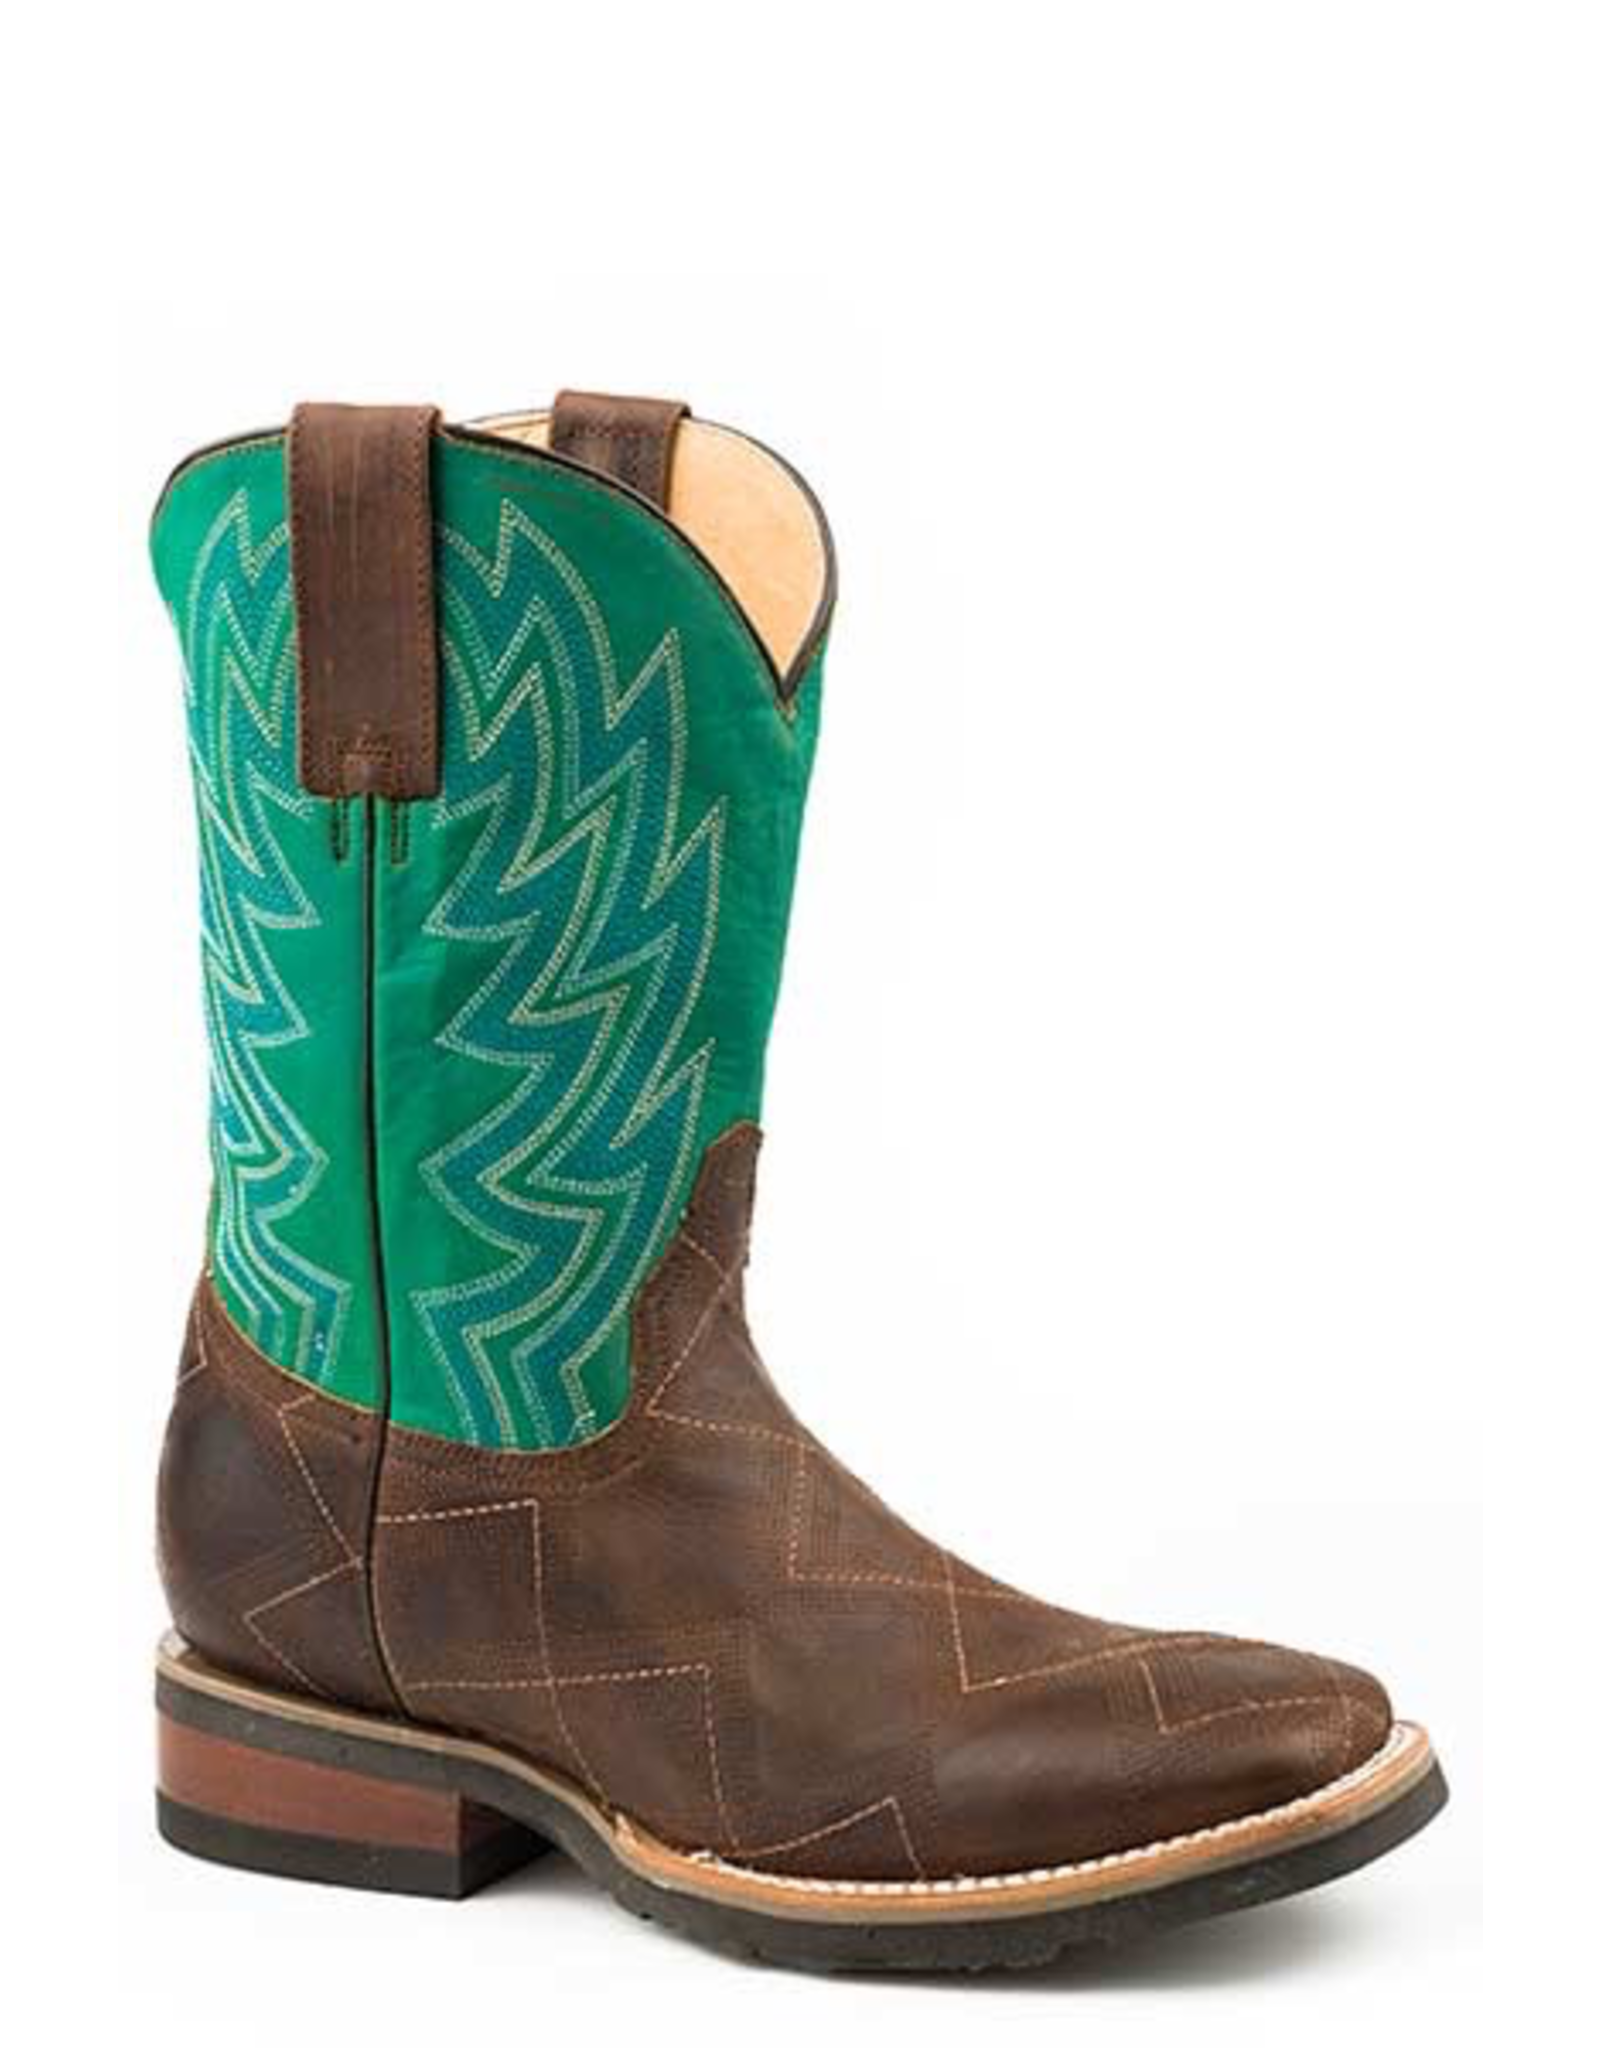 Boots-Men ROPER Garland Stitched Vamp